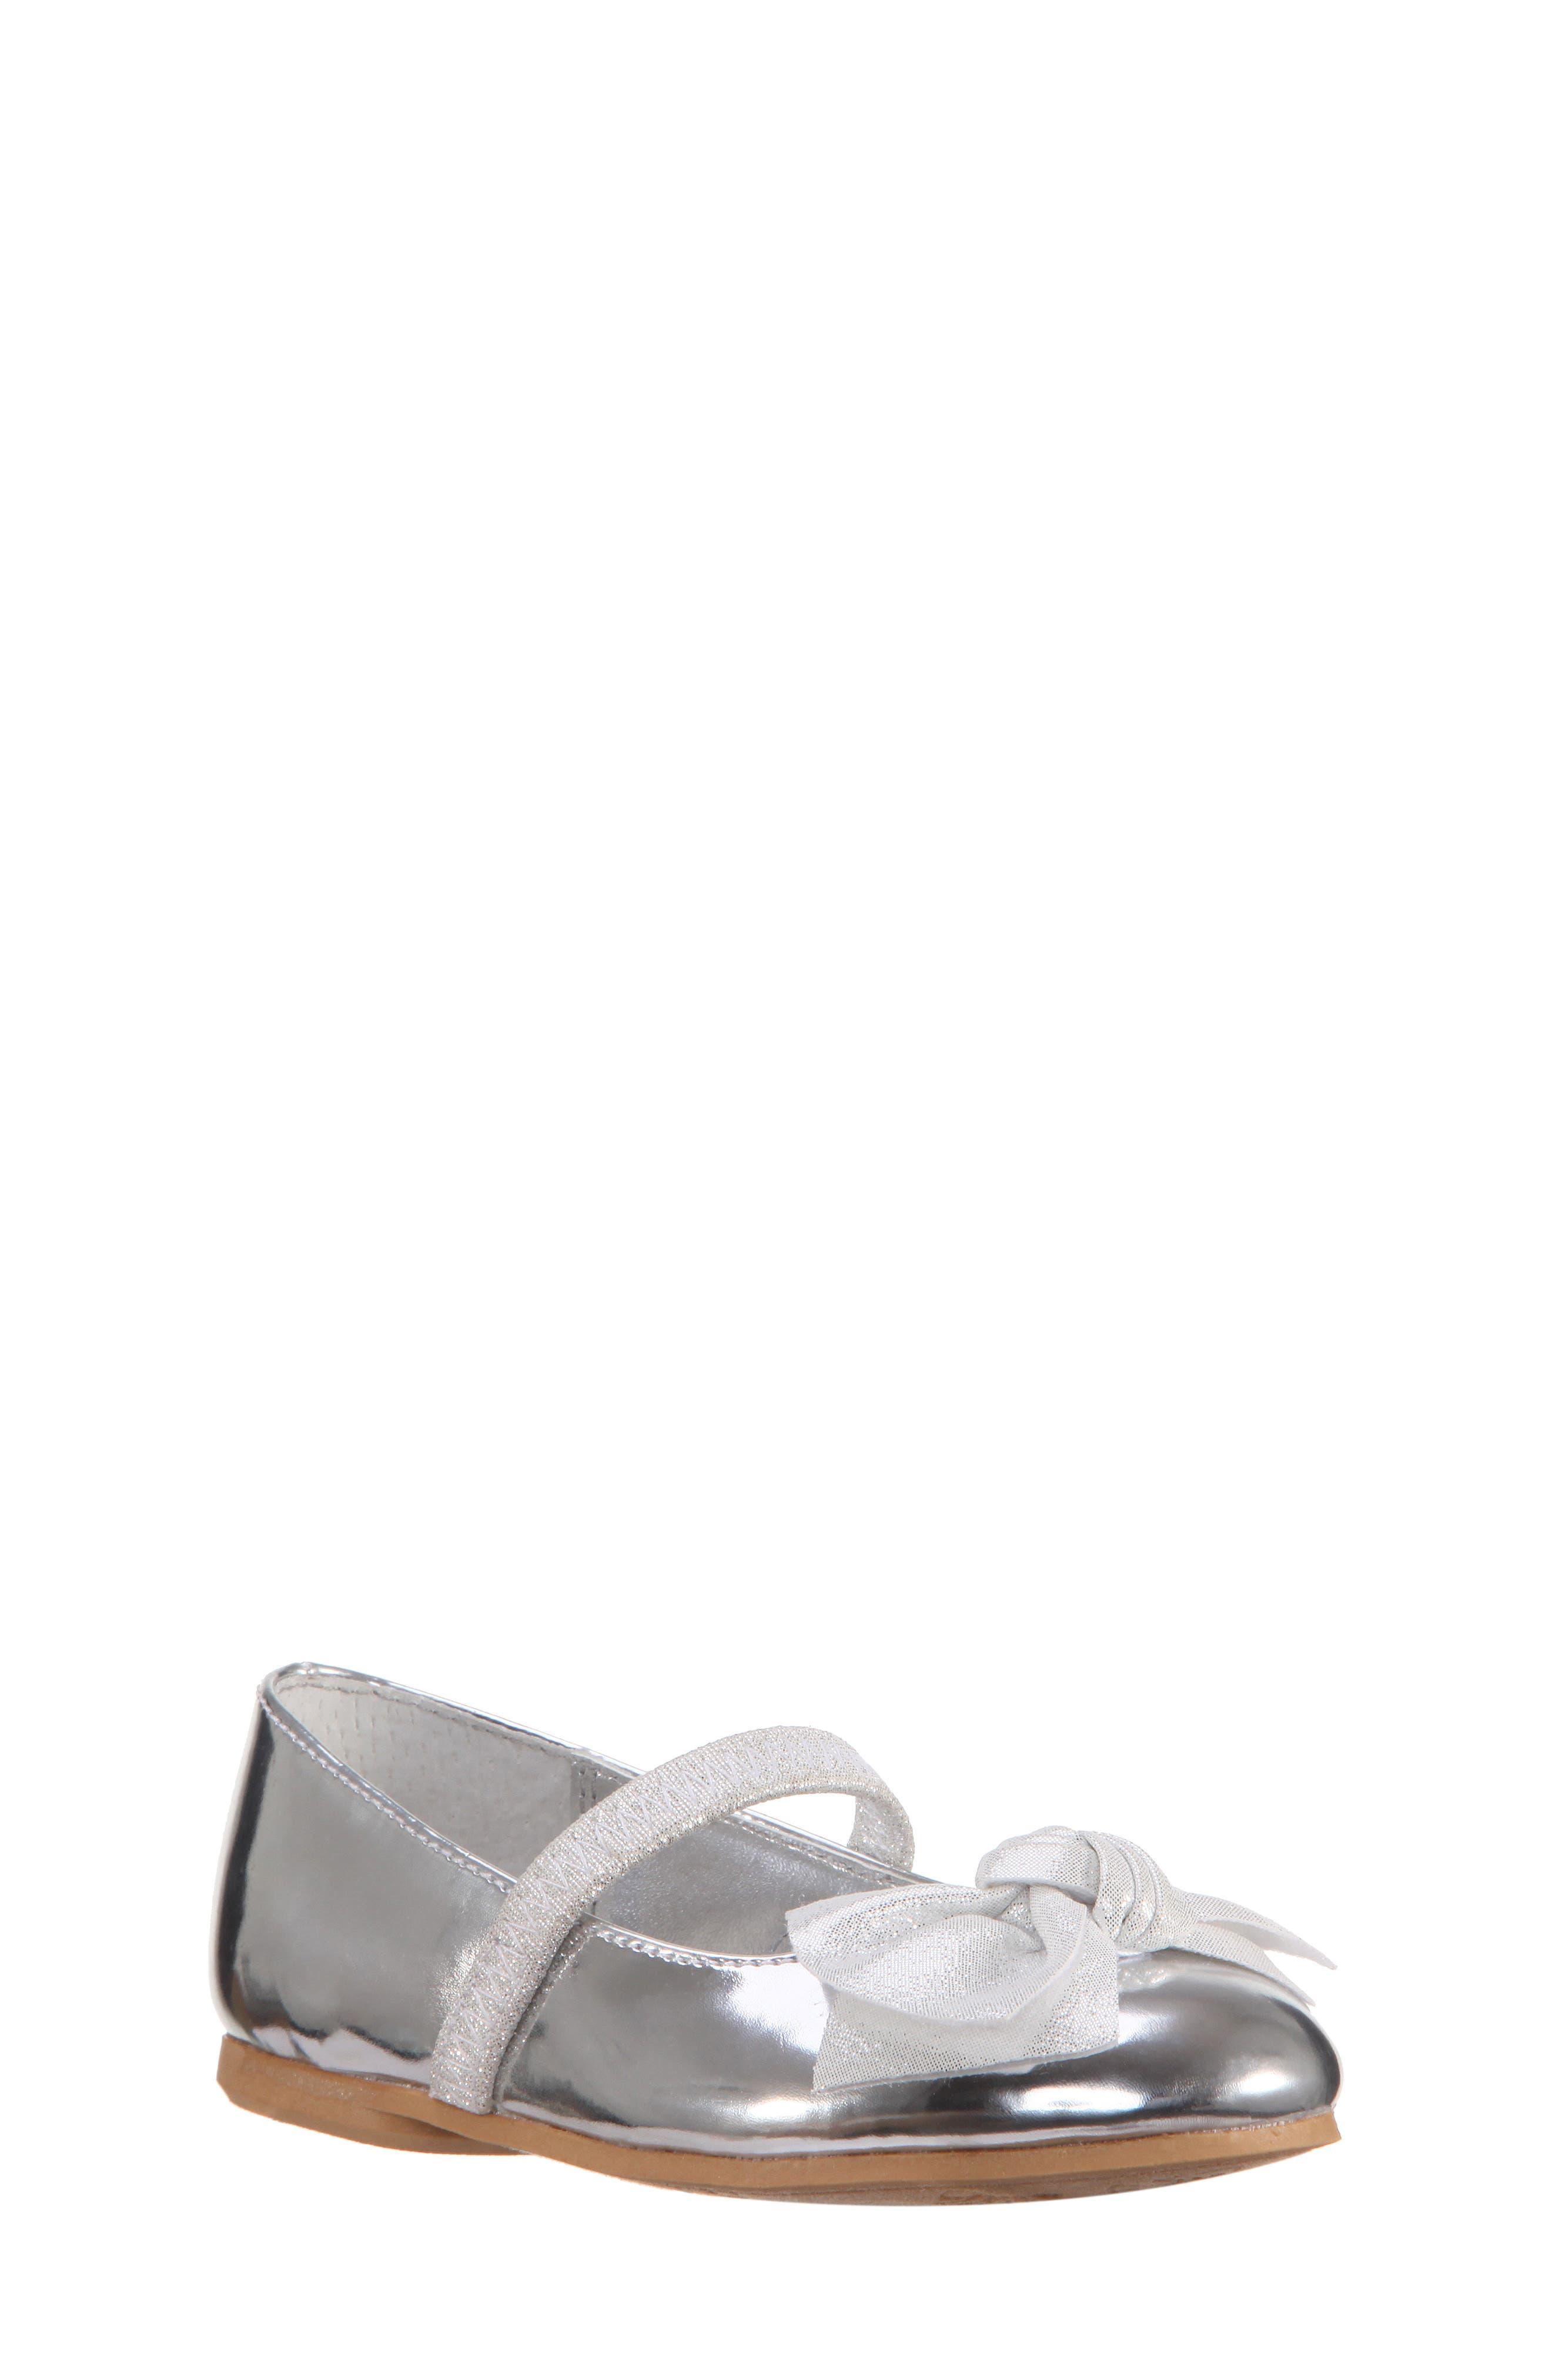 Kaytelyn-T Glitter Bow Ballet Flat,                         Main,                         color,